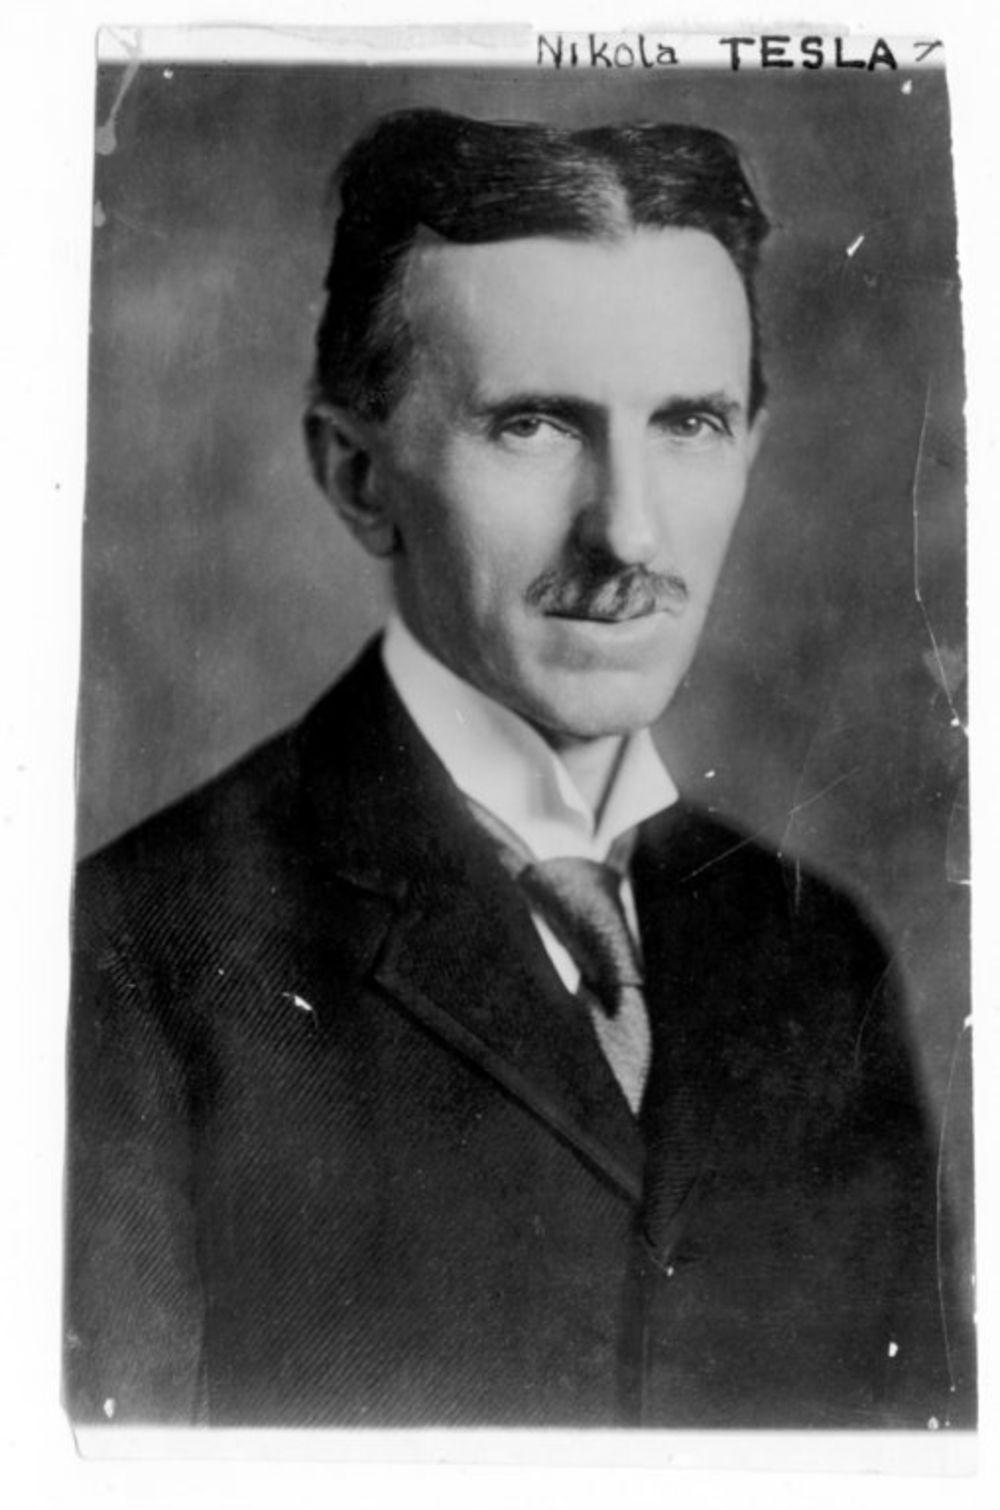 Nikola Tesla, Profimedia